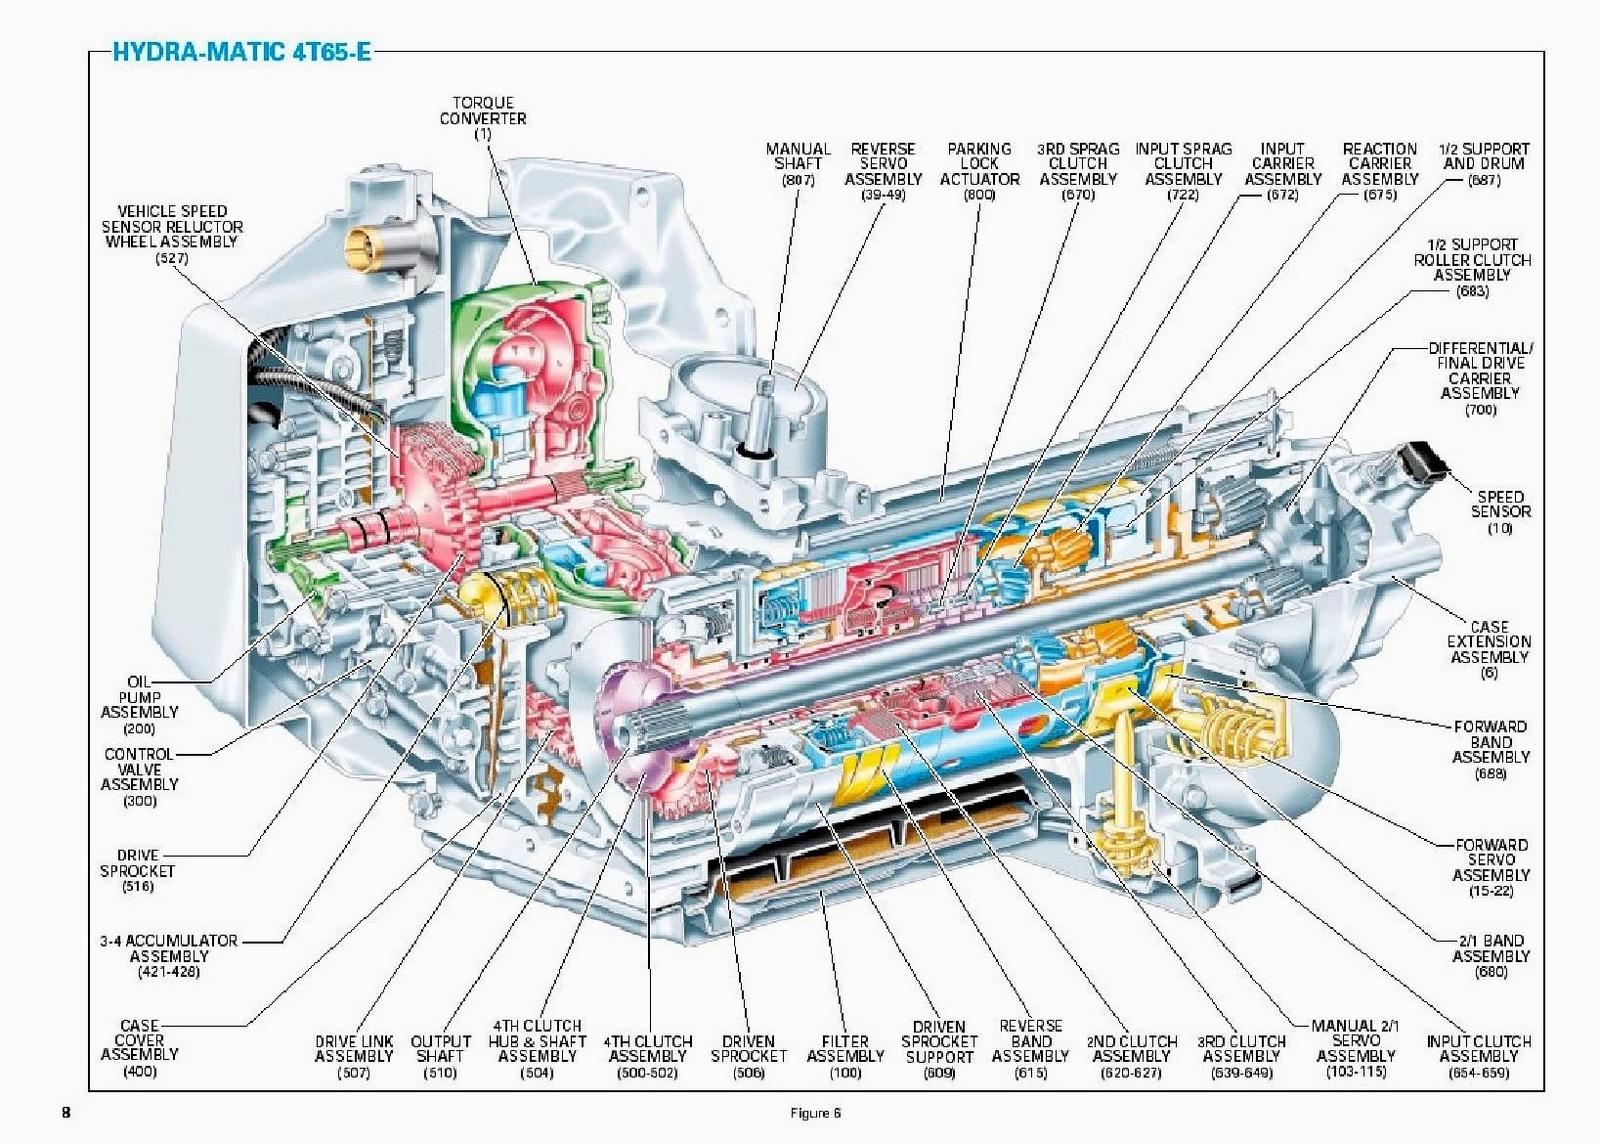 01 Impala Low Coolant Wiring Diagram Rj45 Shield Ground Wiring Diagram Wire Diag 2005vtx Jeanjaures37 Fr